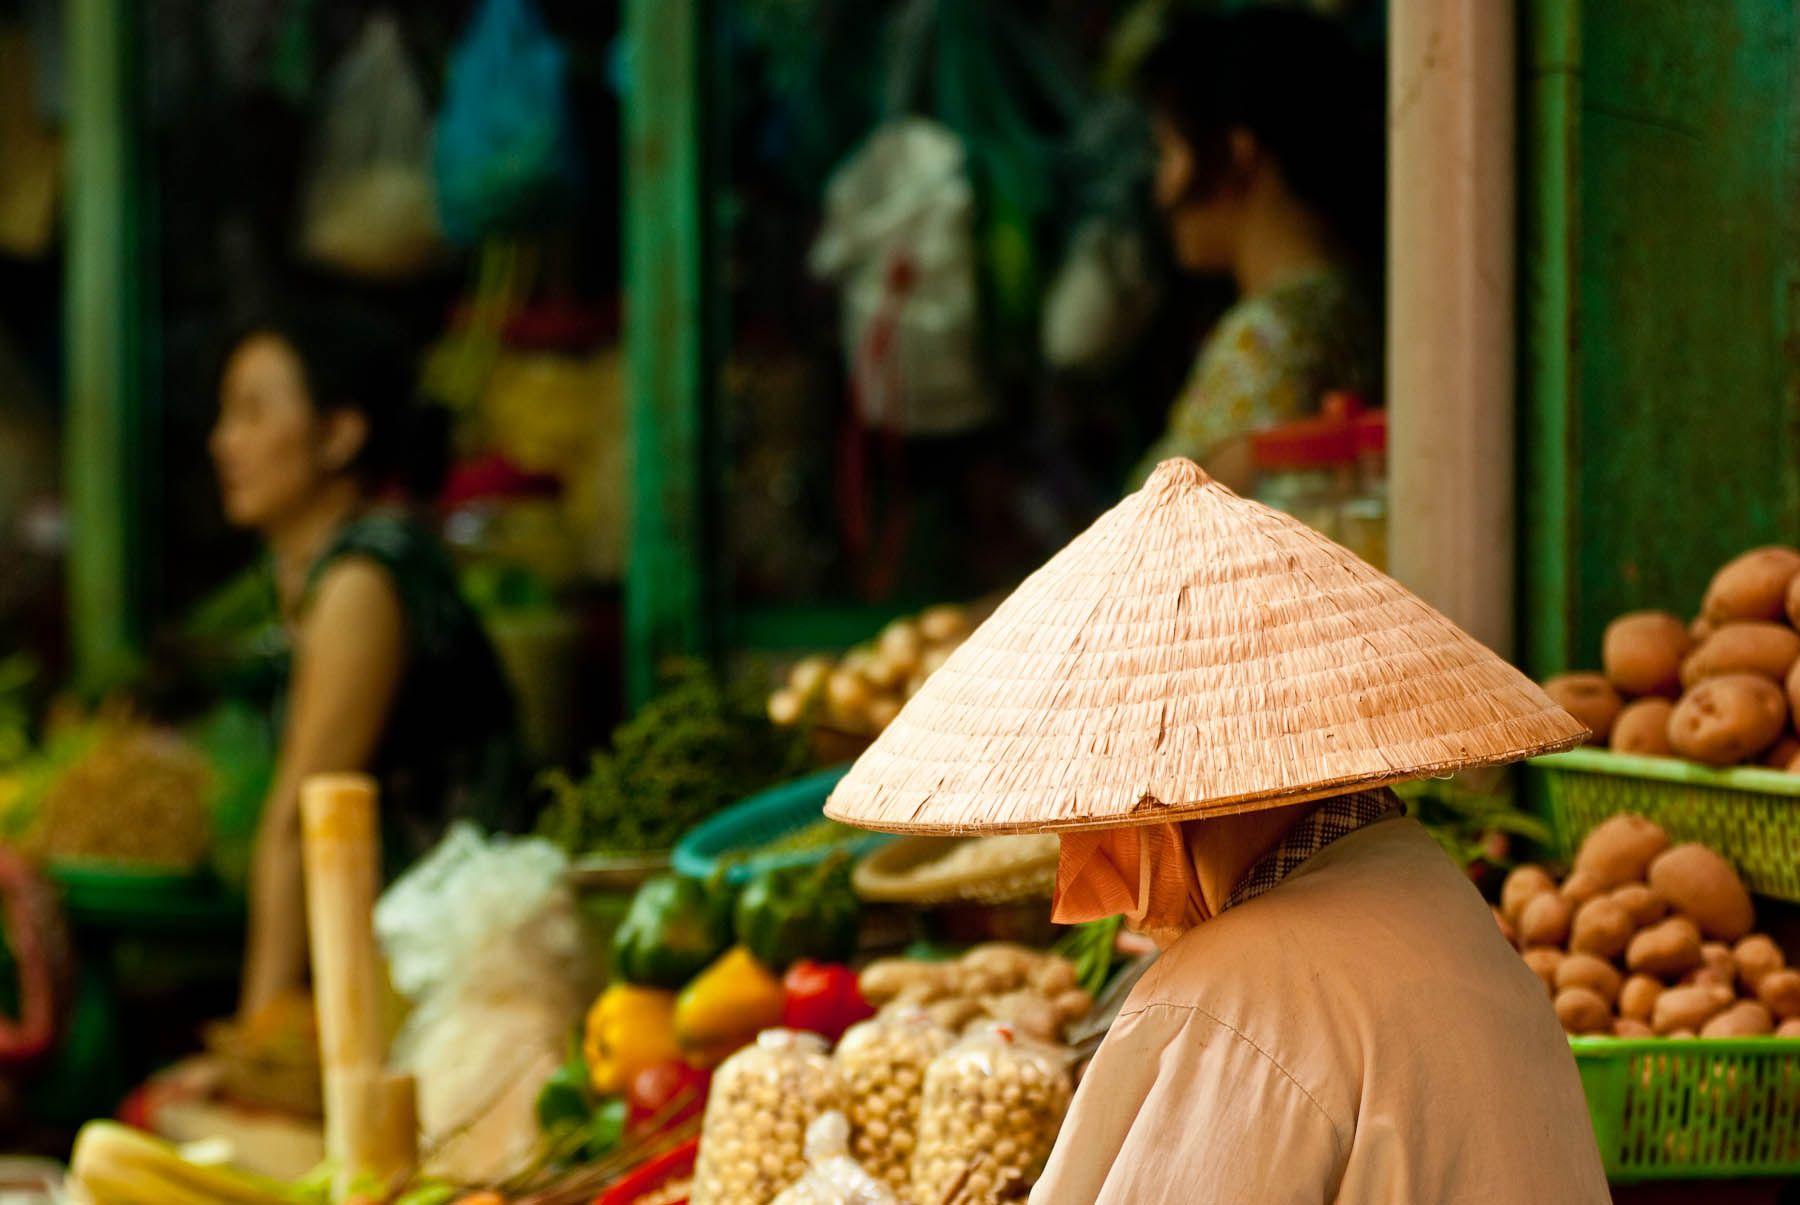 Pin su cina, cambogia, tibet, nepal e vietnam